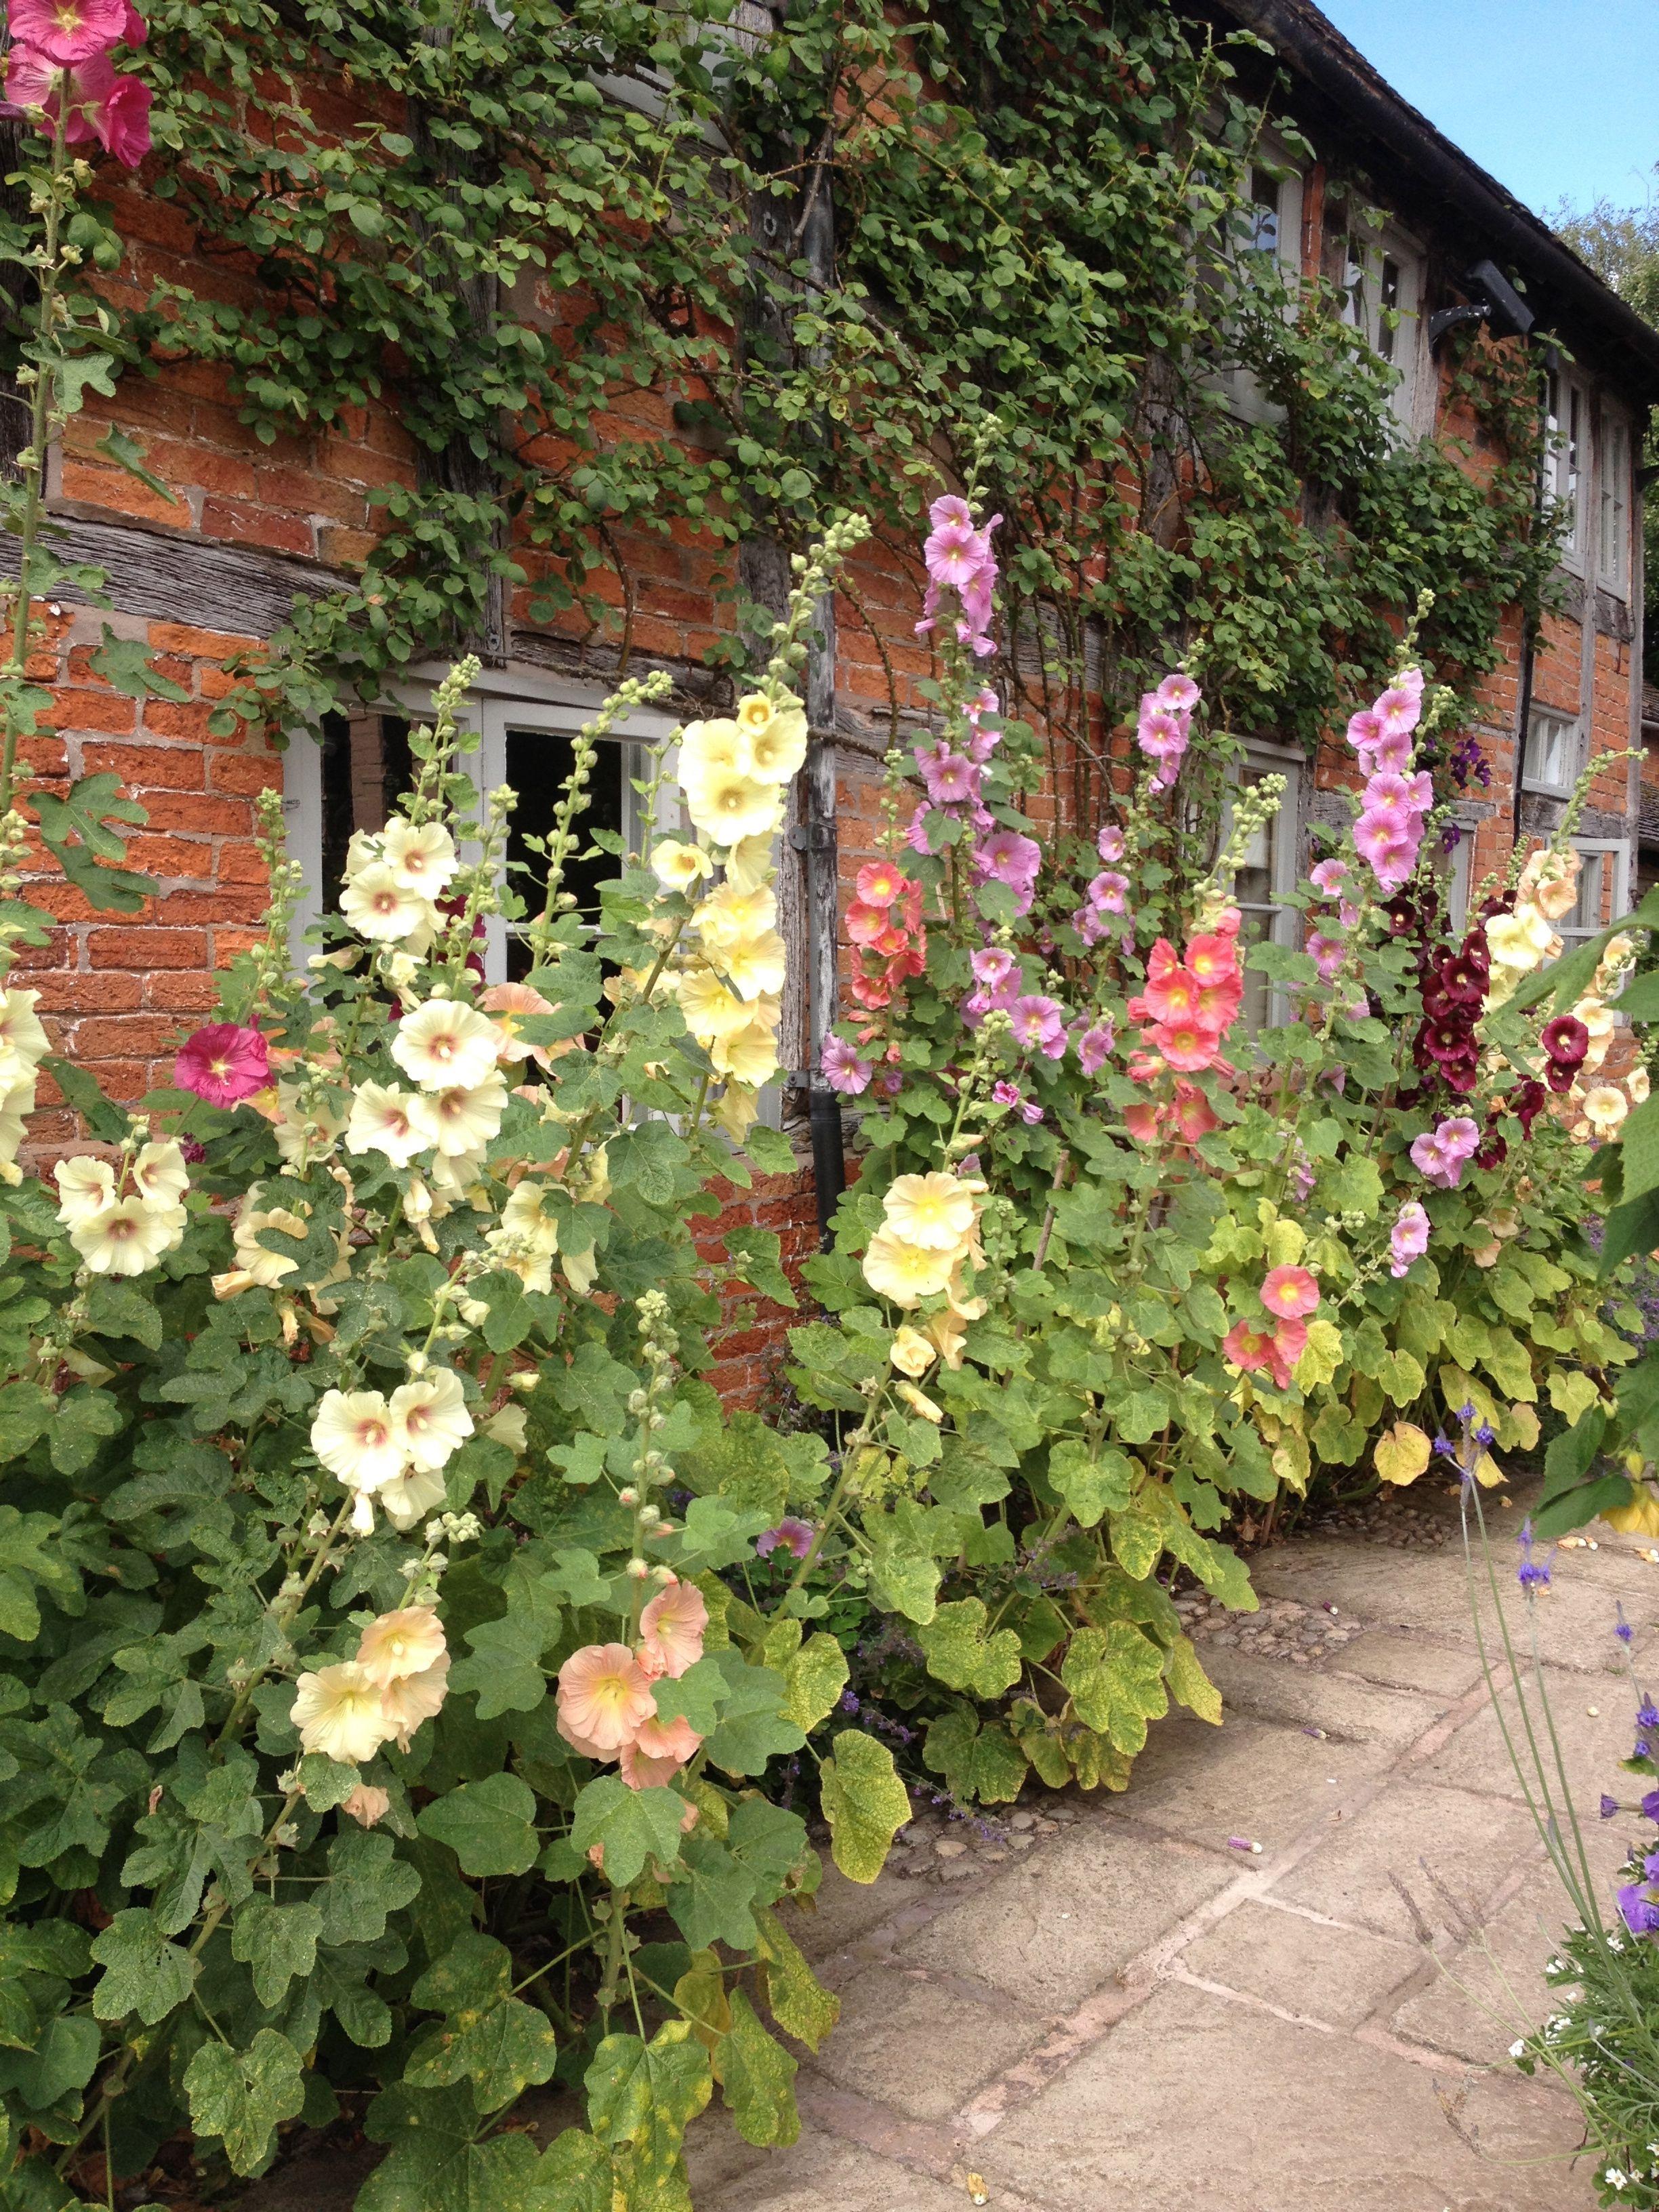 Image result for cottage garden with brick wall garden and flowers image result for cottage garden with brick wall beautiful gardens growing hollyhocks hollyhocks flowers izmirmasajfo